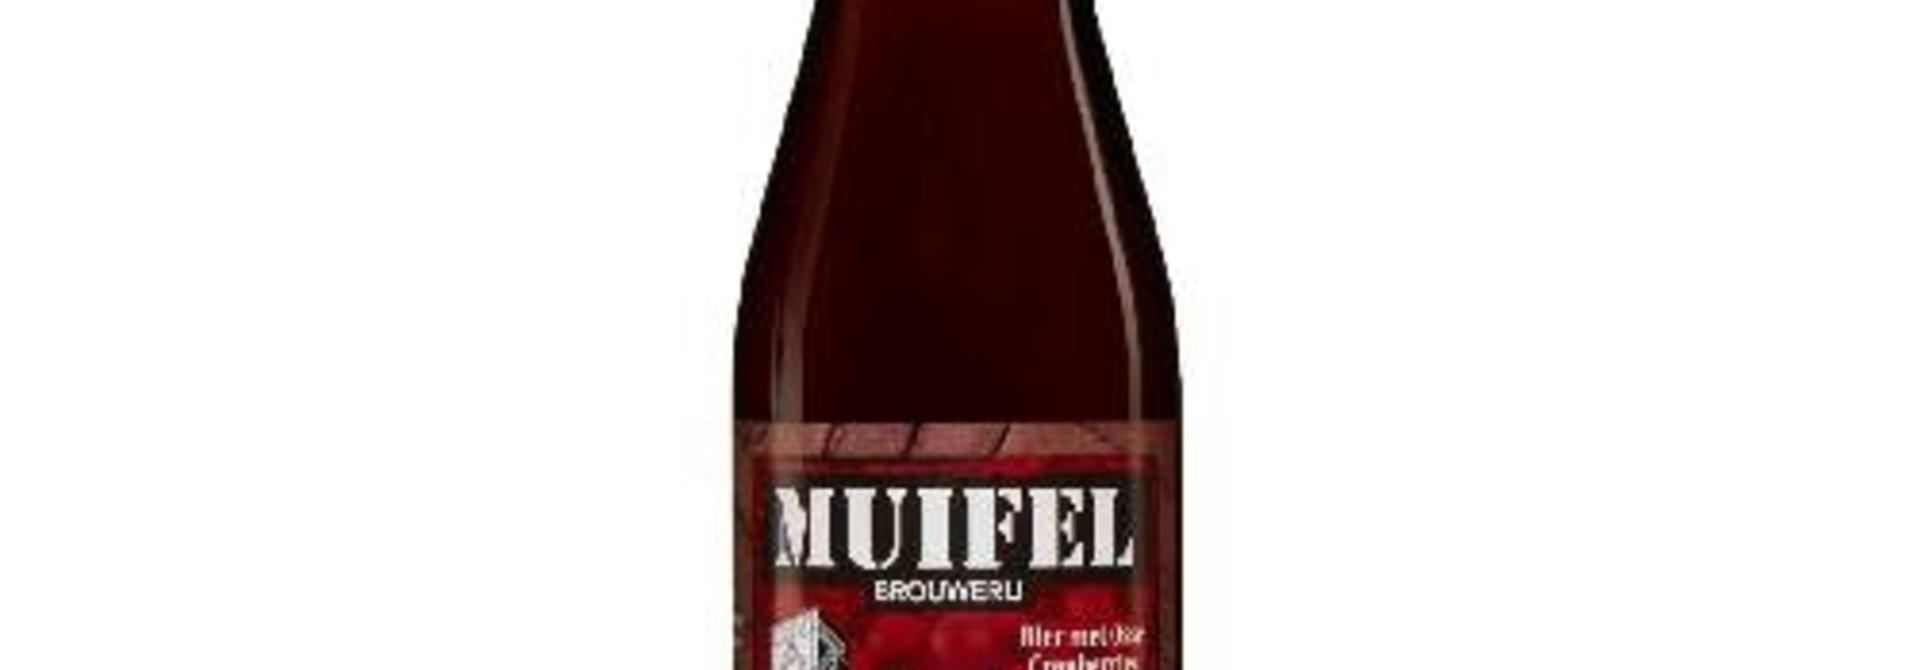 MUIFEL - MESSENTREKKER 33CL